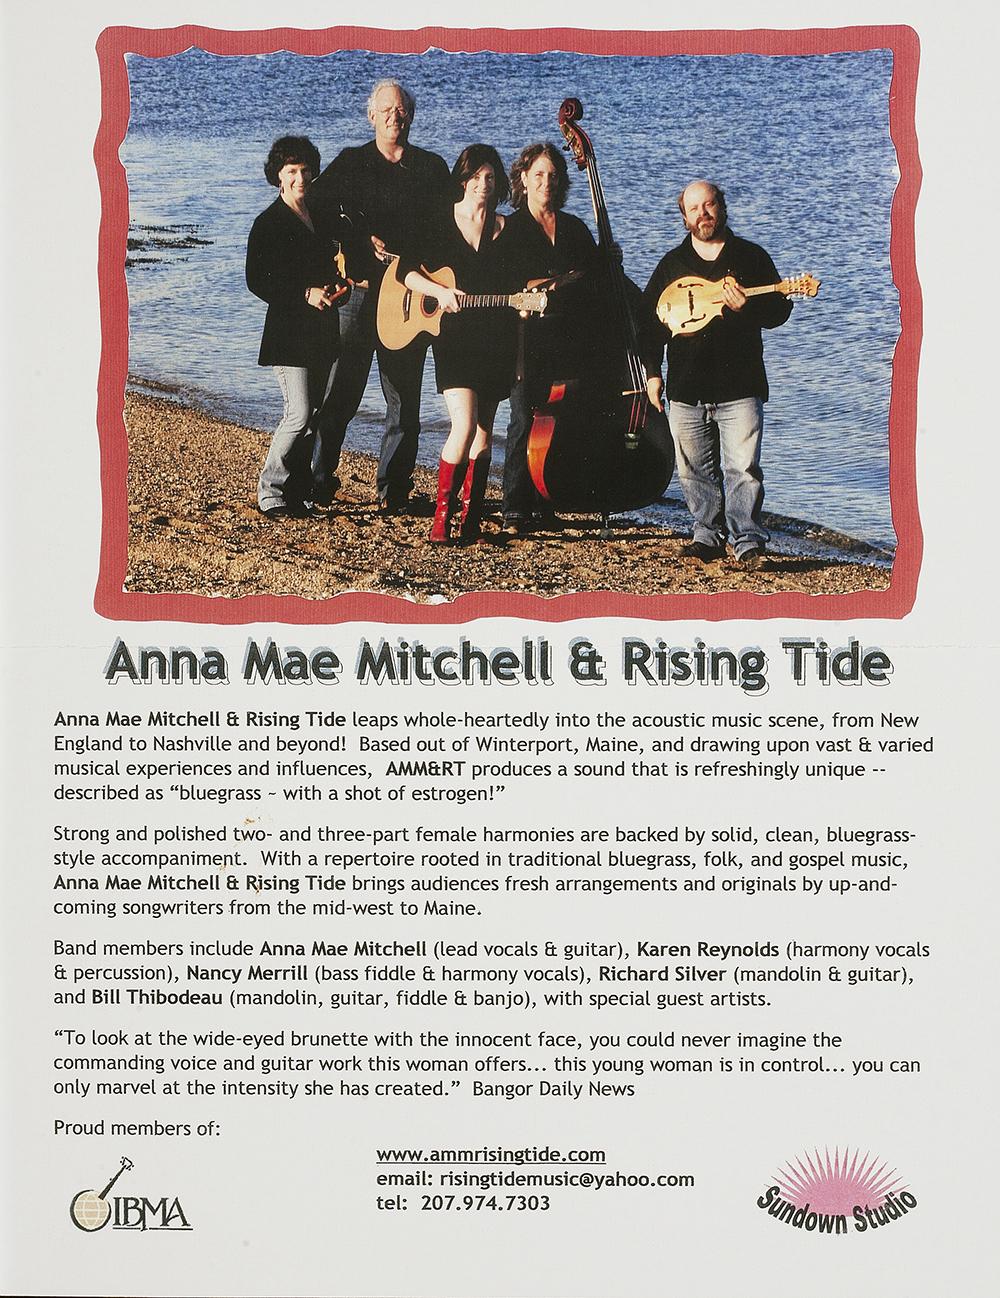 BIOG-0991, Anna Mae Mitchell & Rising Tide, 2008